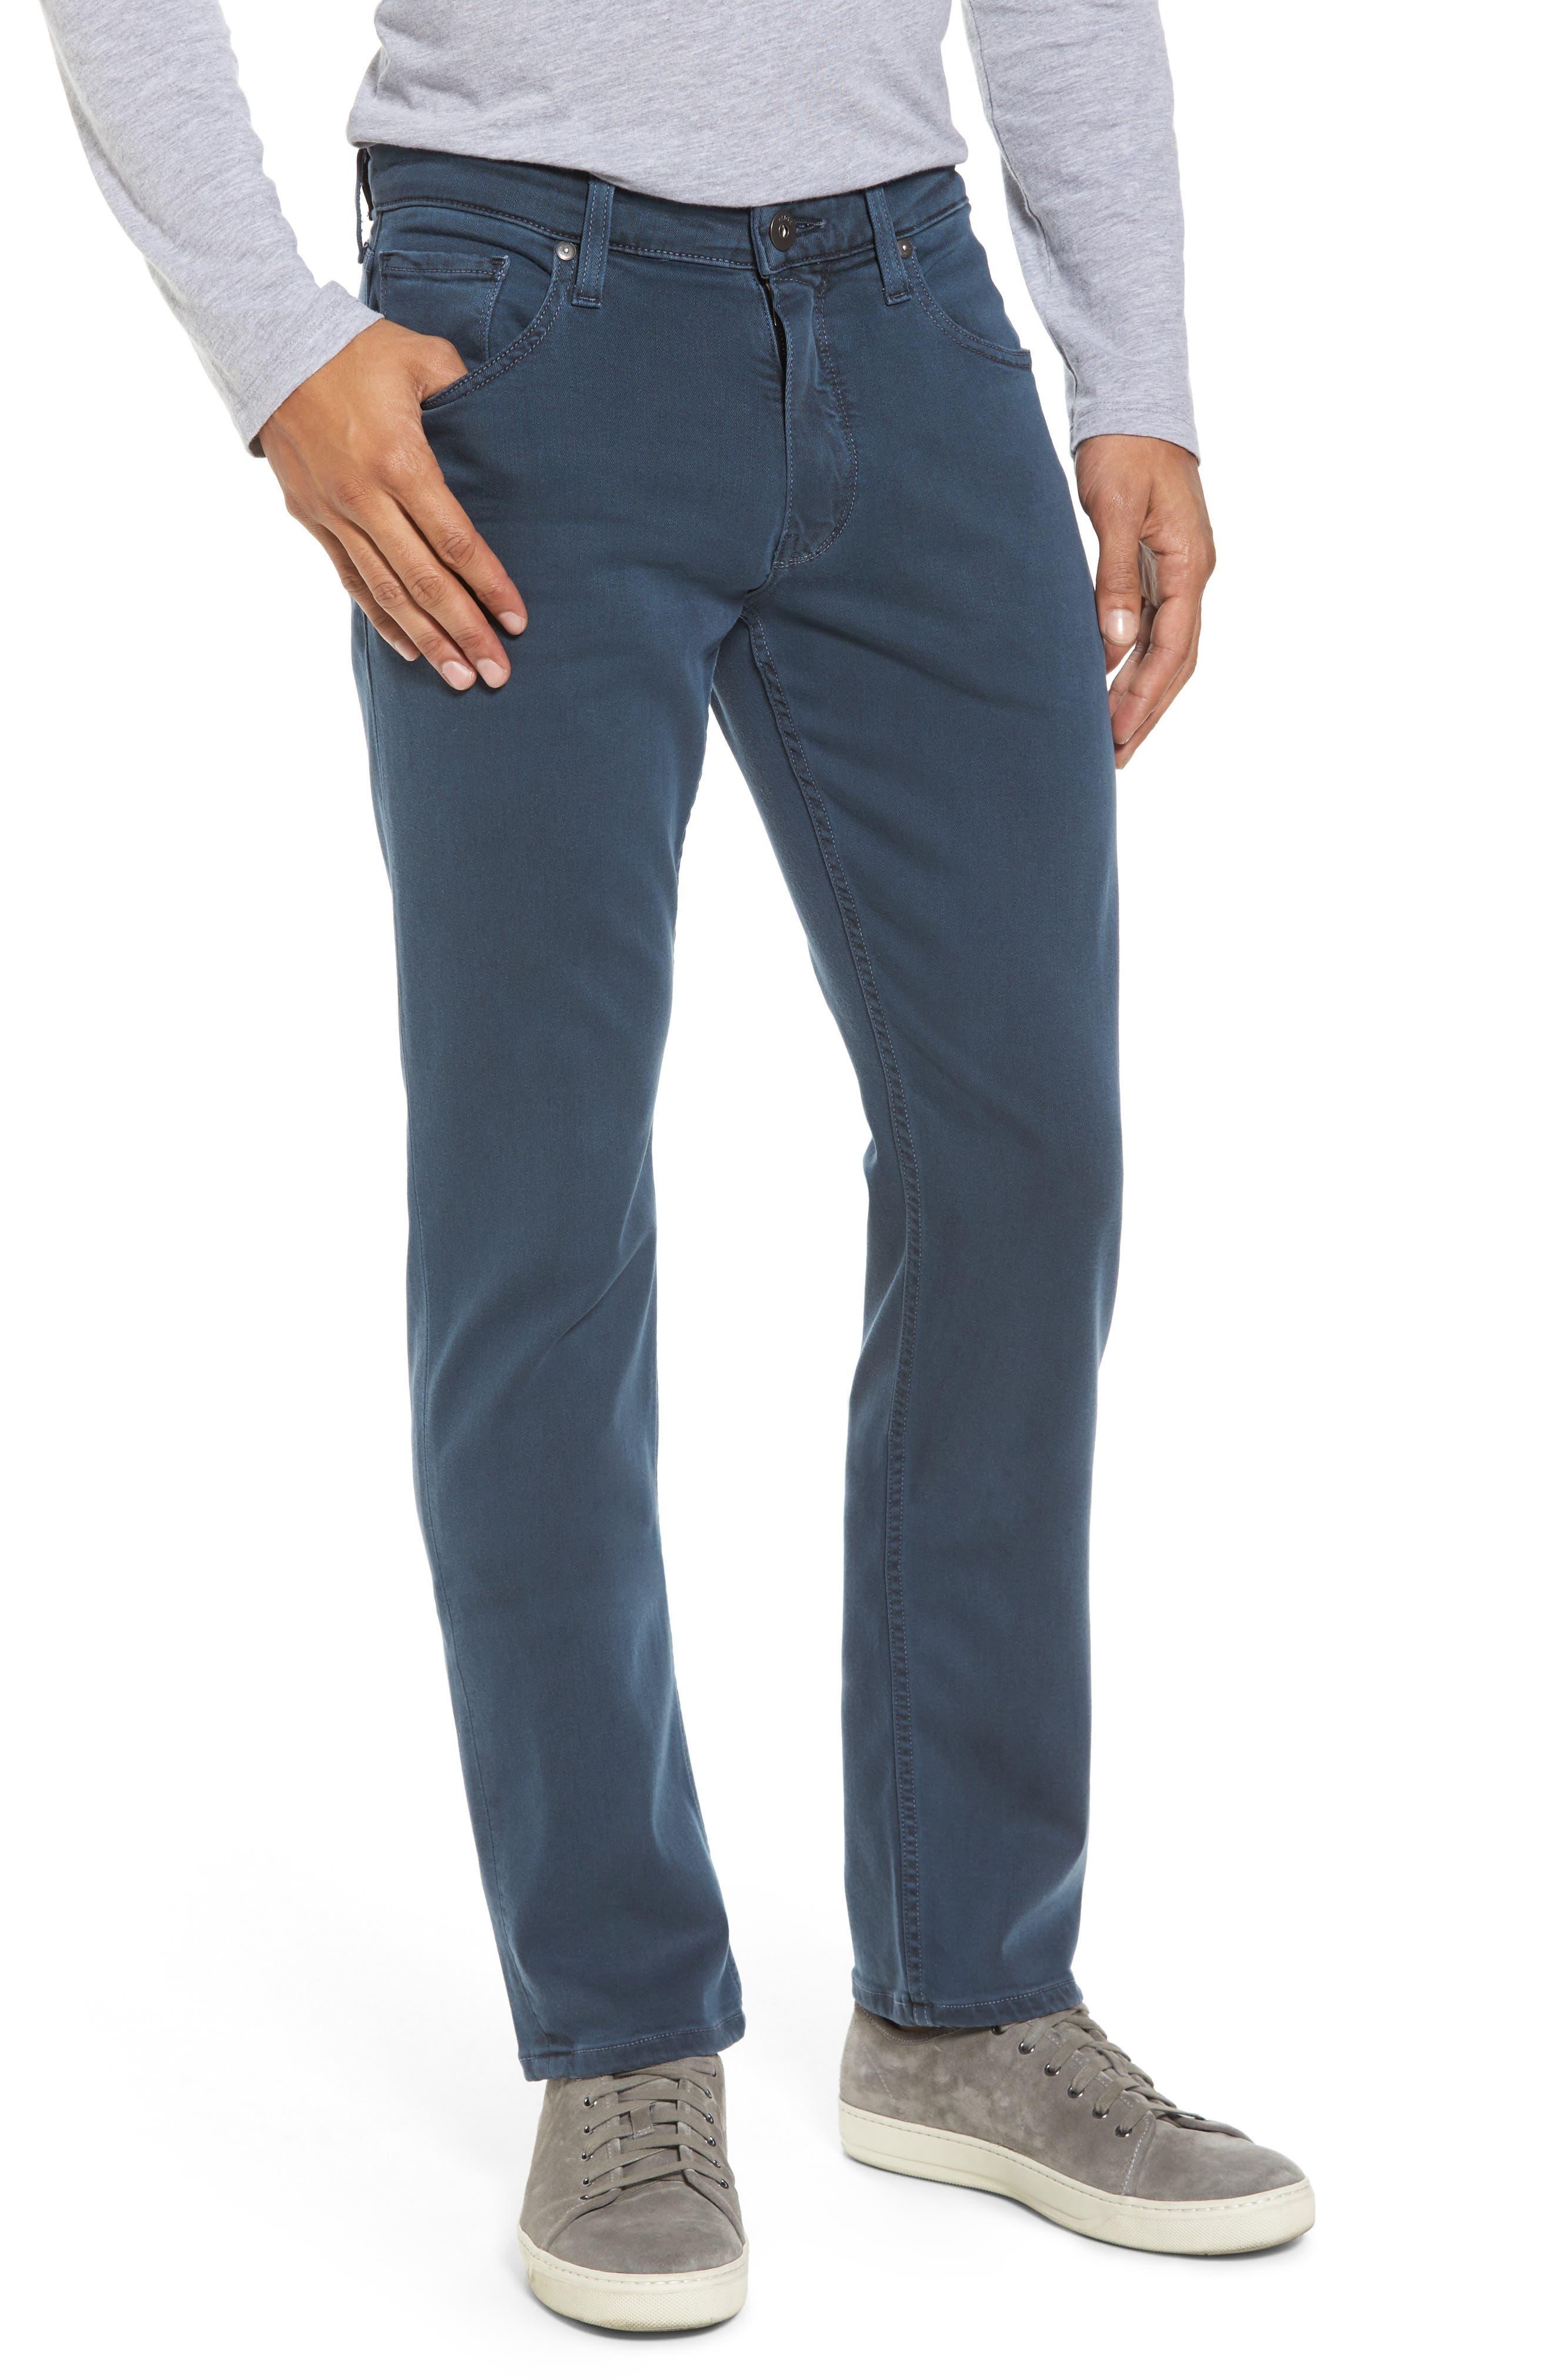 Transcend - Federal Slim Straight Fit Jeans,                         Main,                         color, Vintage Amalfi